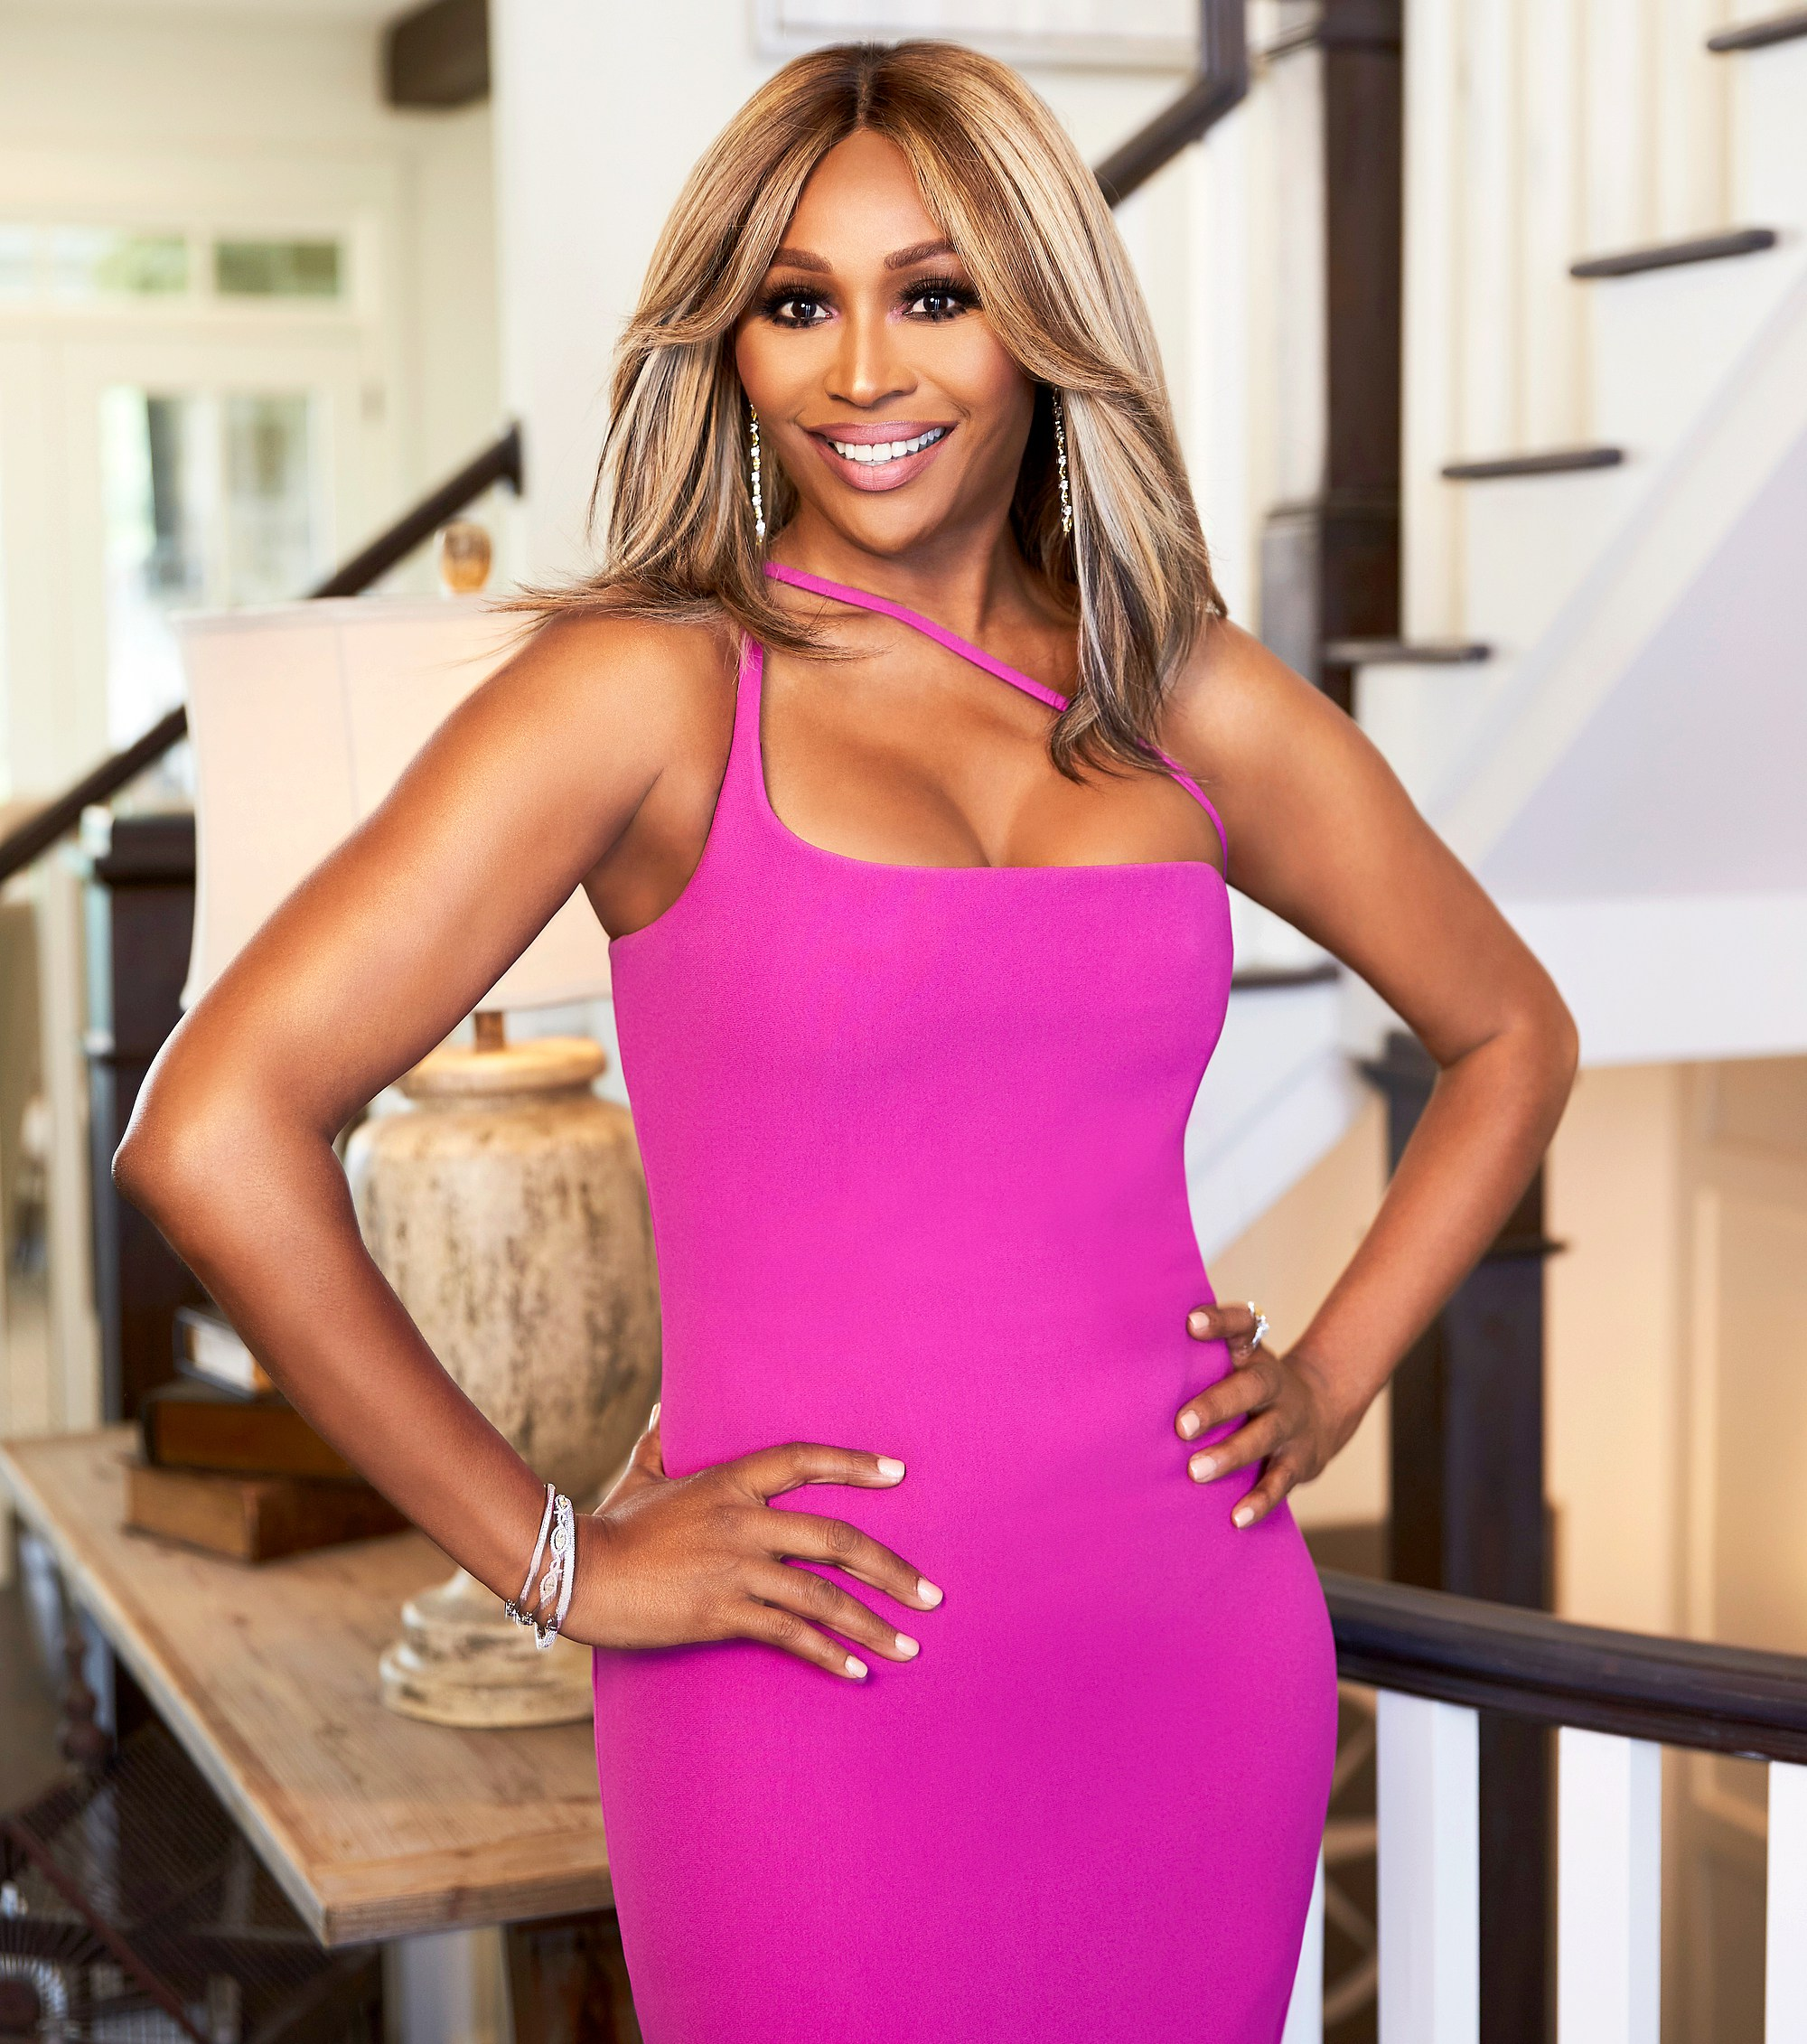 'Real Housewives of Atlanta' star Cynthia Bailey